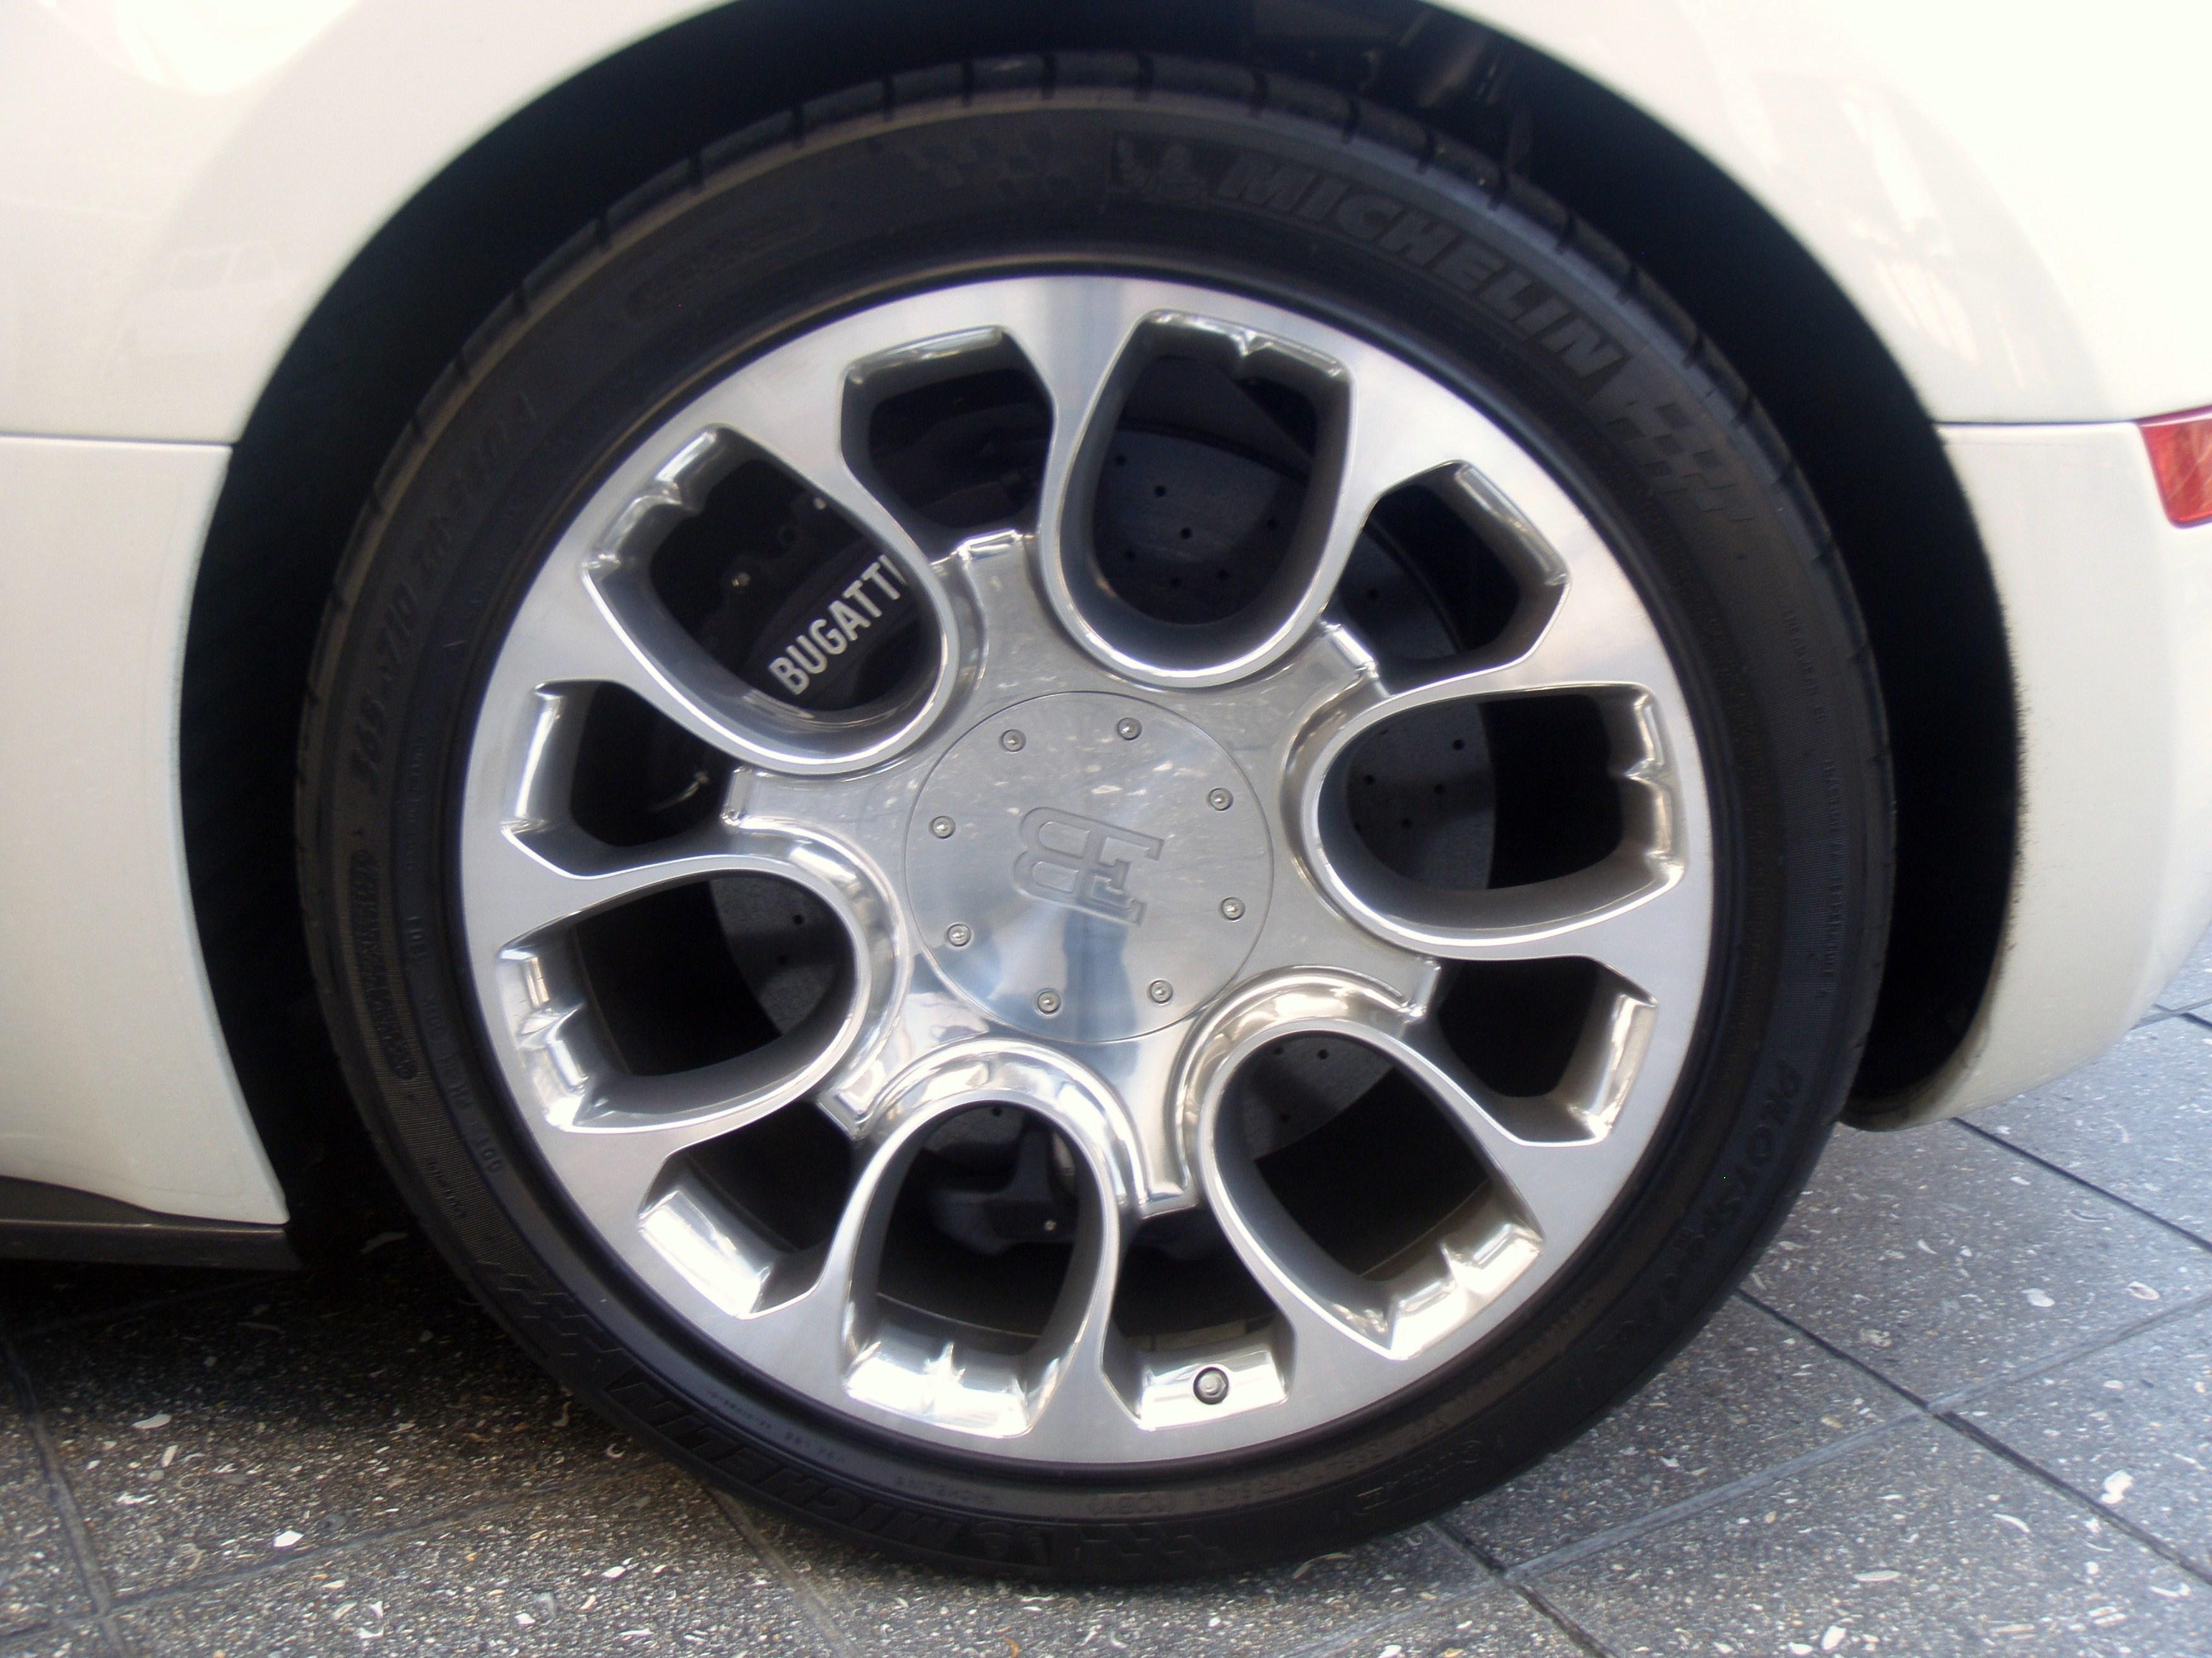 file bugatti veyron eb 16 4 grand sport wheel jpg wikimedia commons. Black Bedroom Furniture Sets. Home Design Ideas